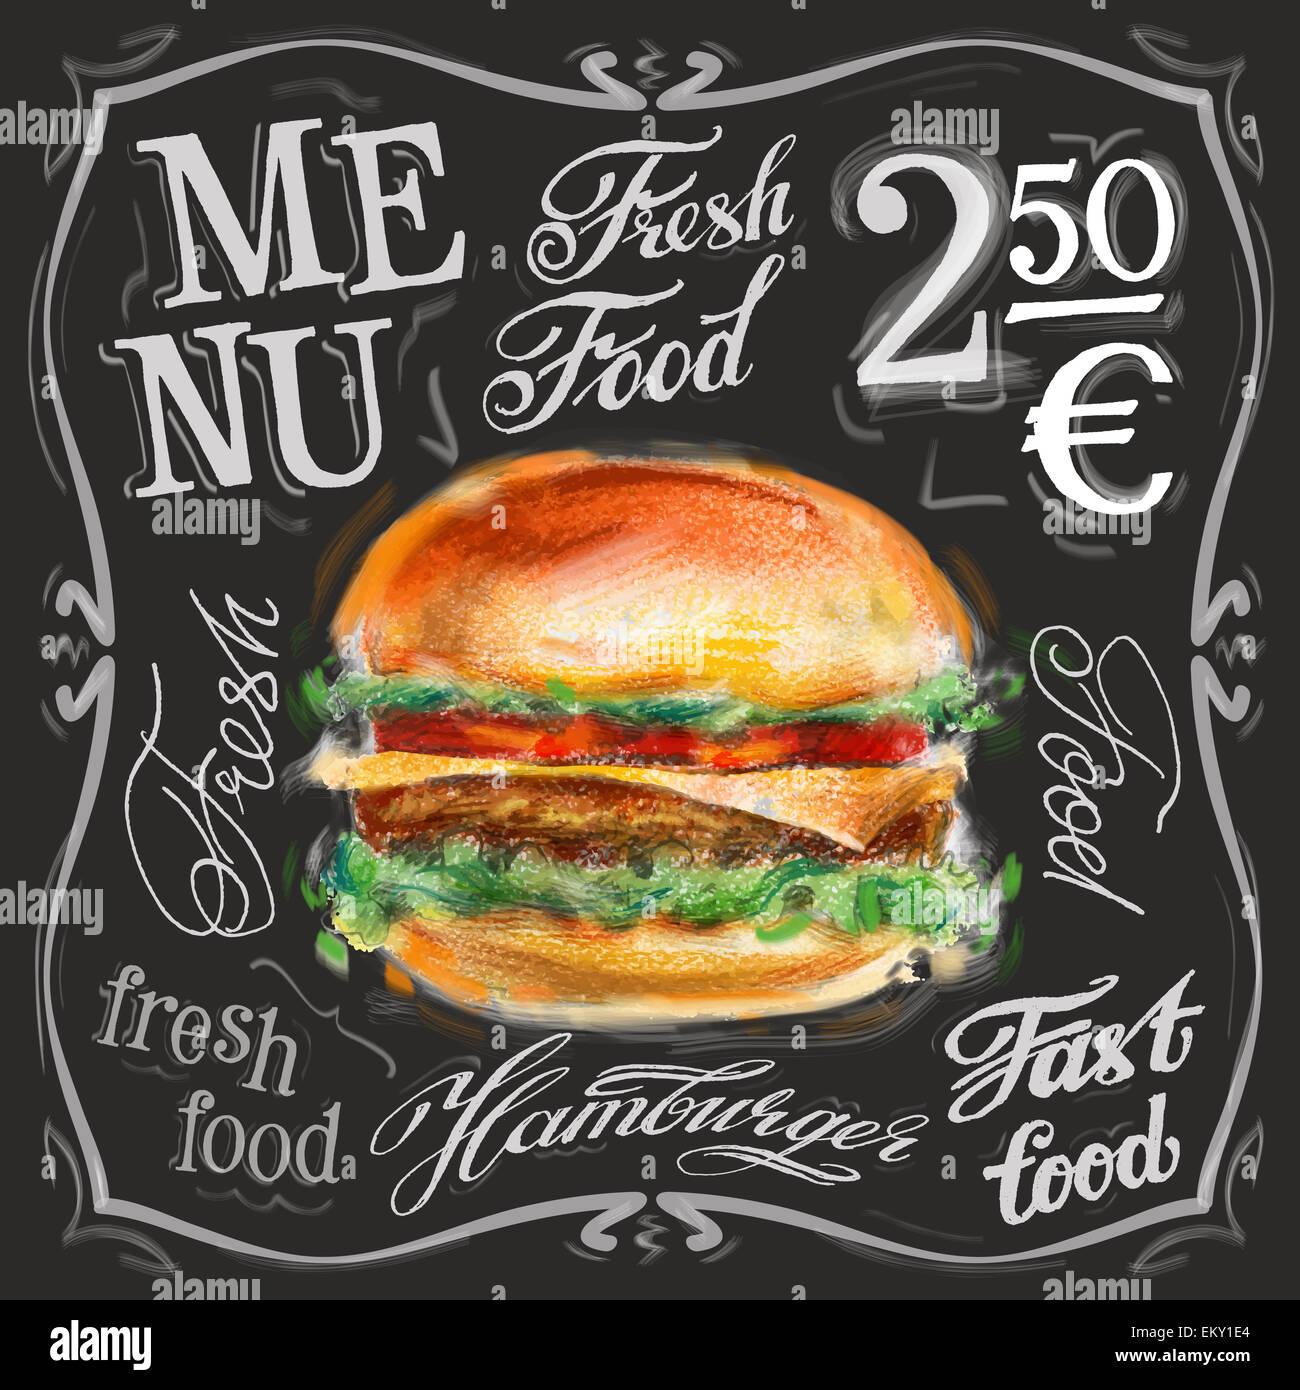 Retro Fast Food Menu Vector Png